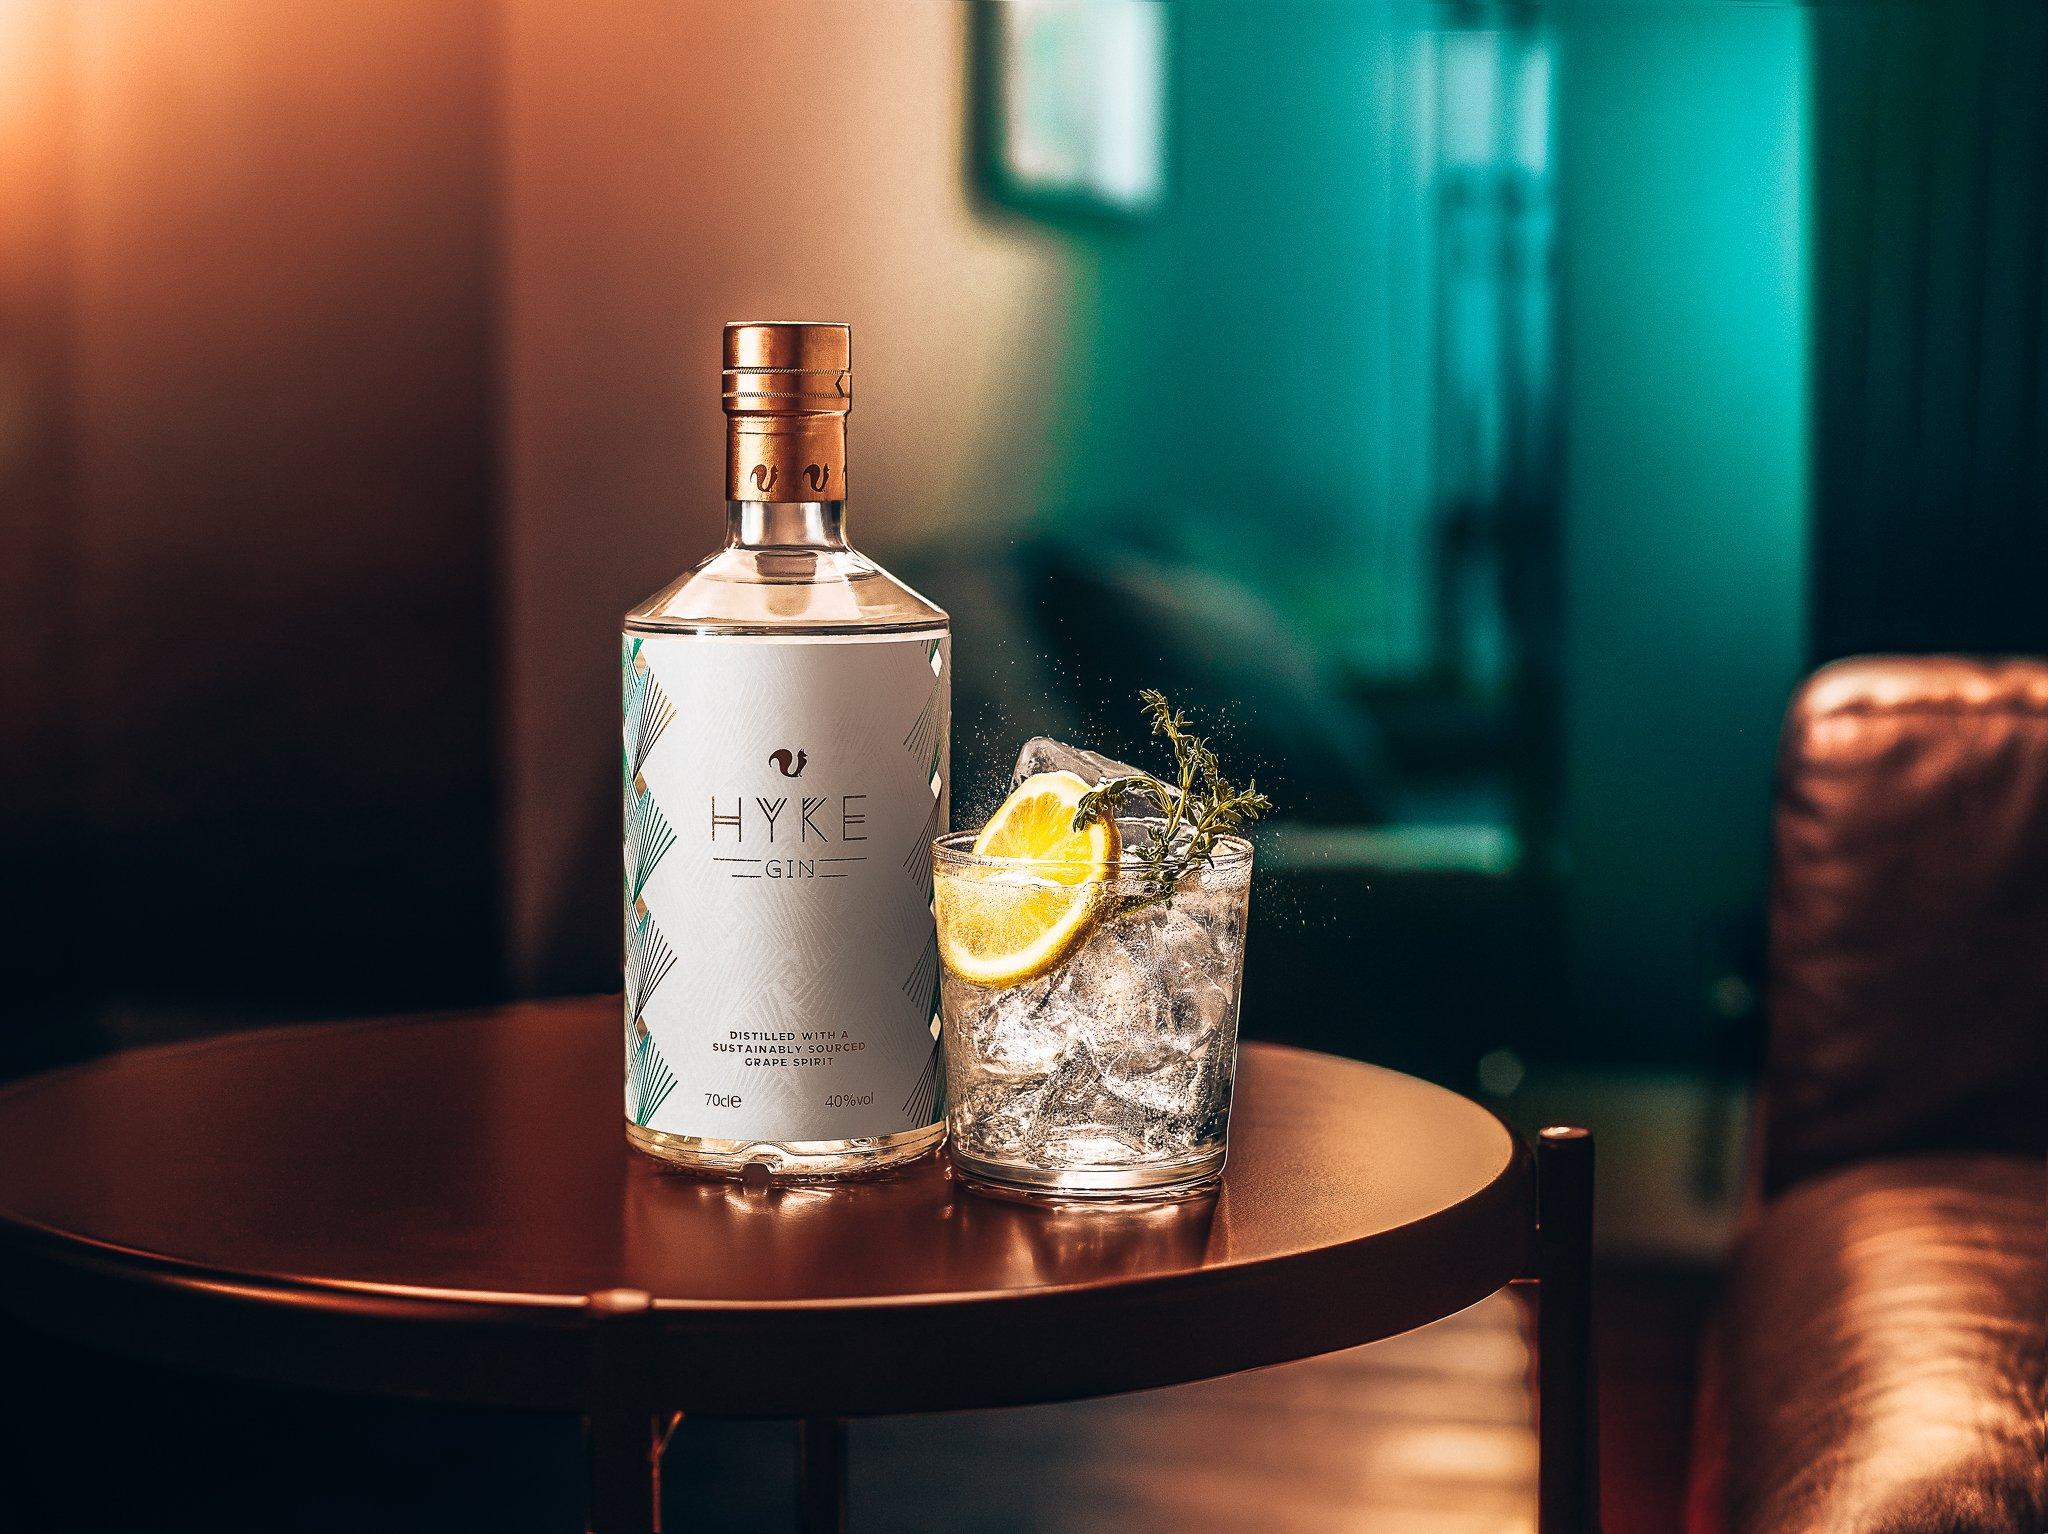 HYKE G&T, Gin-tonic met HYKE Gin, Alles over gin.